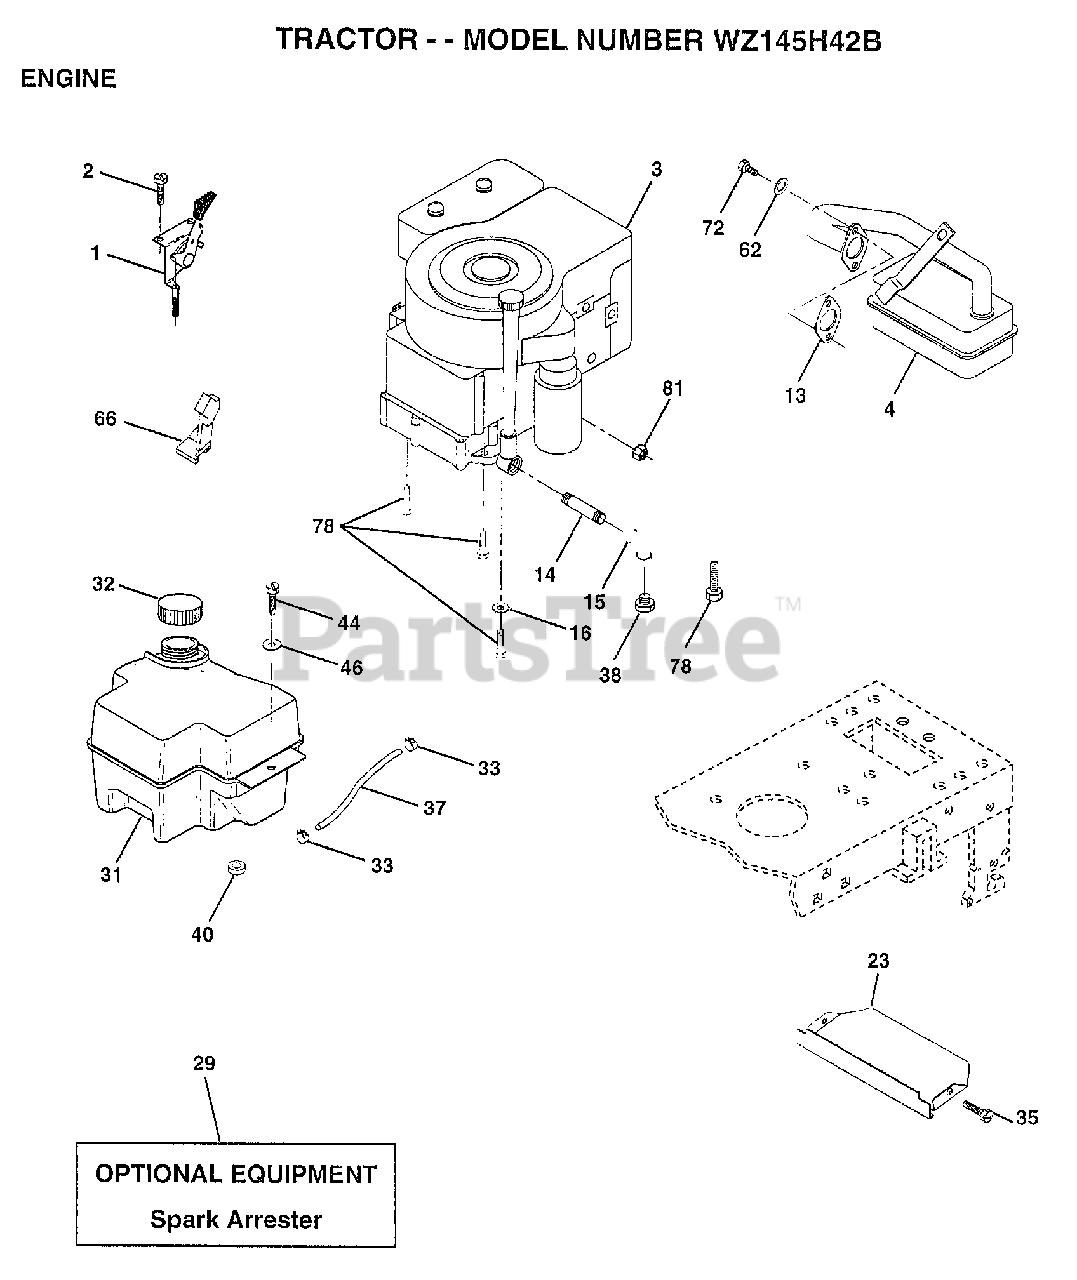 Electrolux Ayp Wz 145h42 B